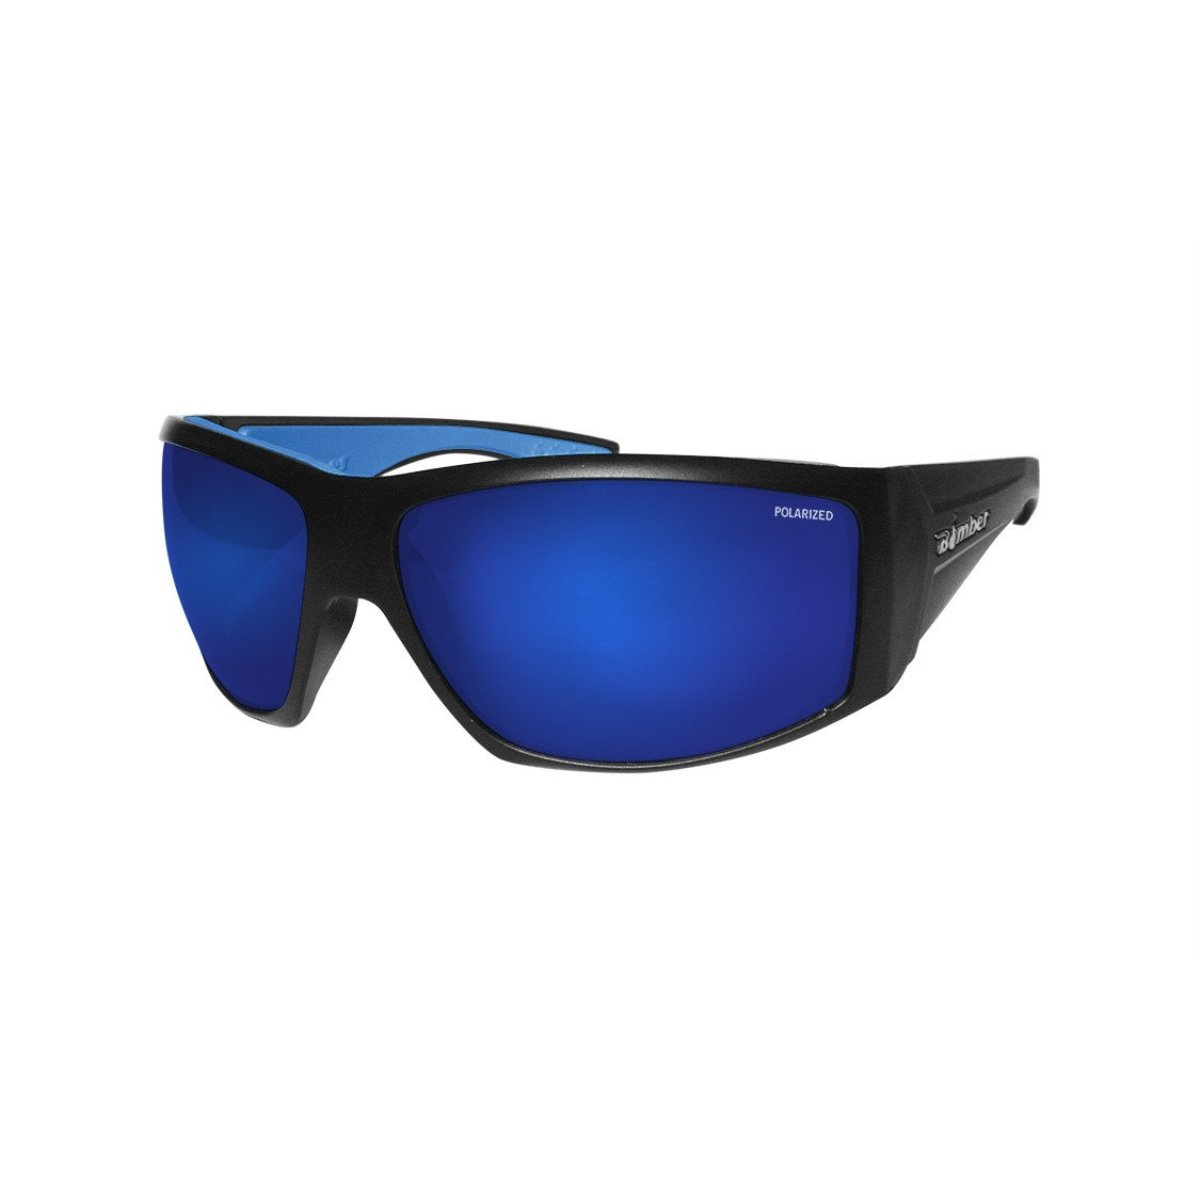 Bomber Sonnenbrille – Ahi matt schwarz FRM Blau Mirror Polarized Lens Schaumstoff blau